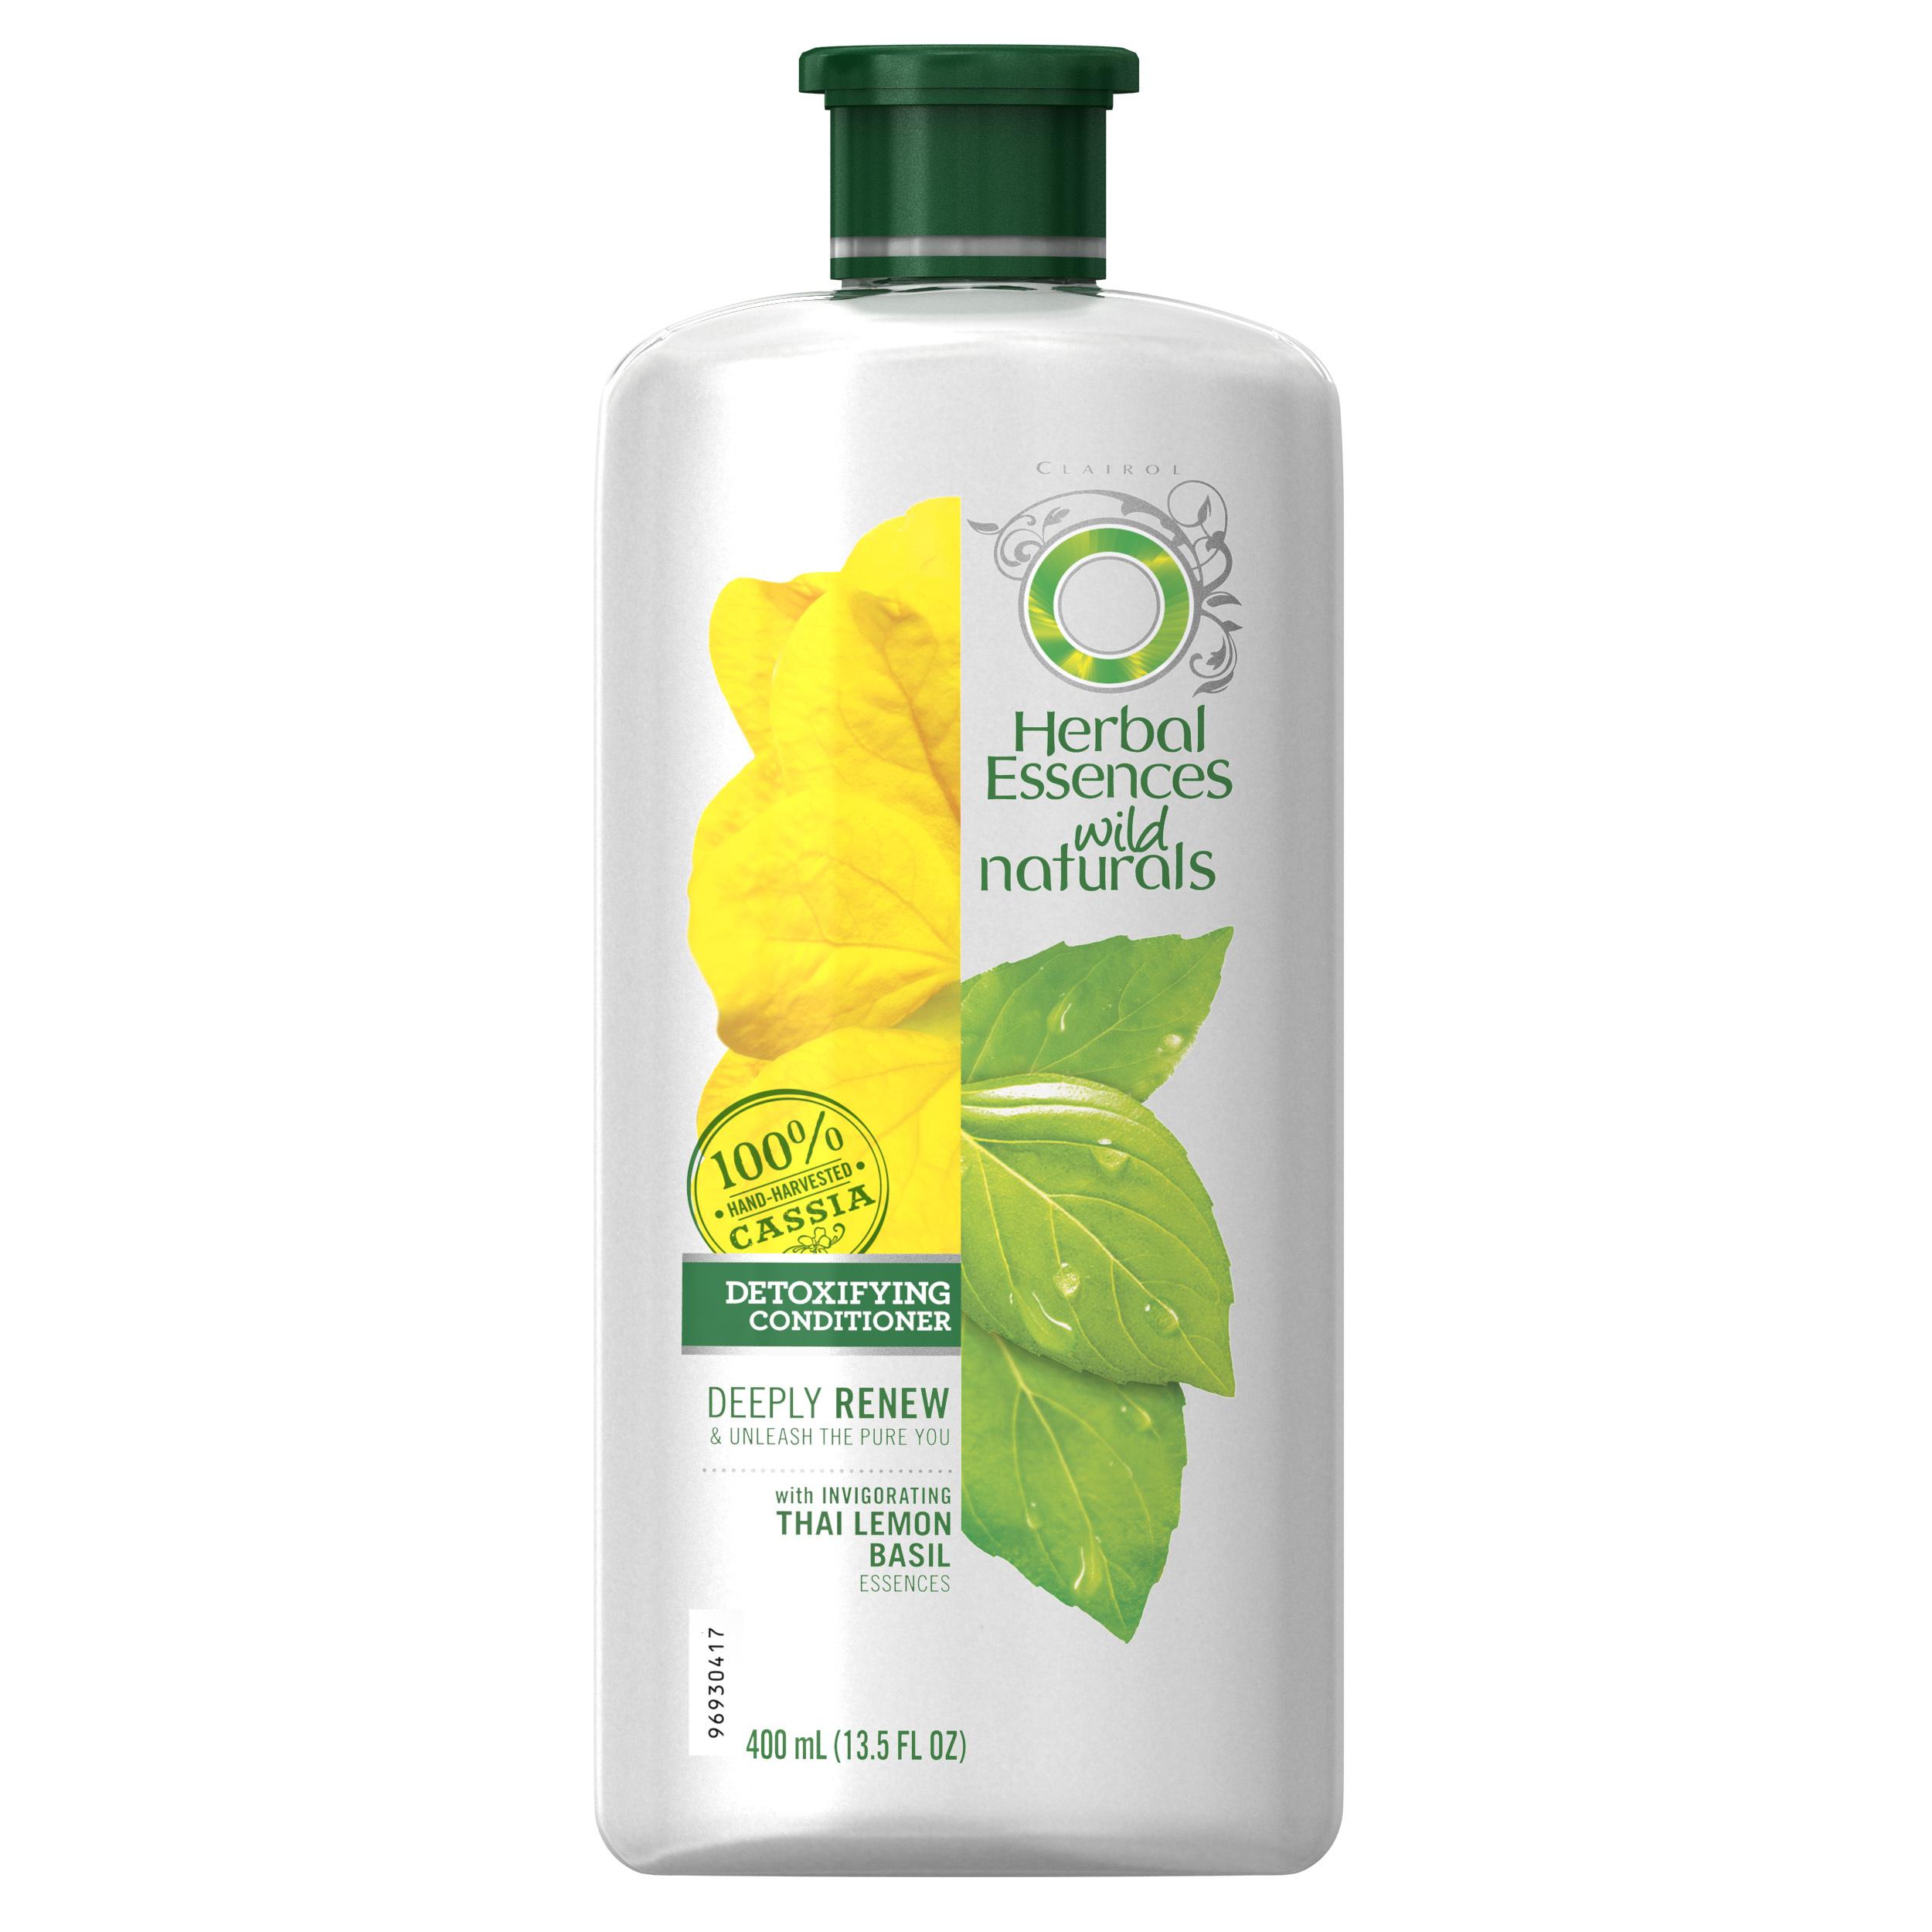 Herbal Essences Wild Naturals Detoxifying Conditioner